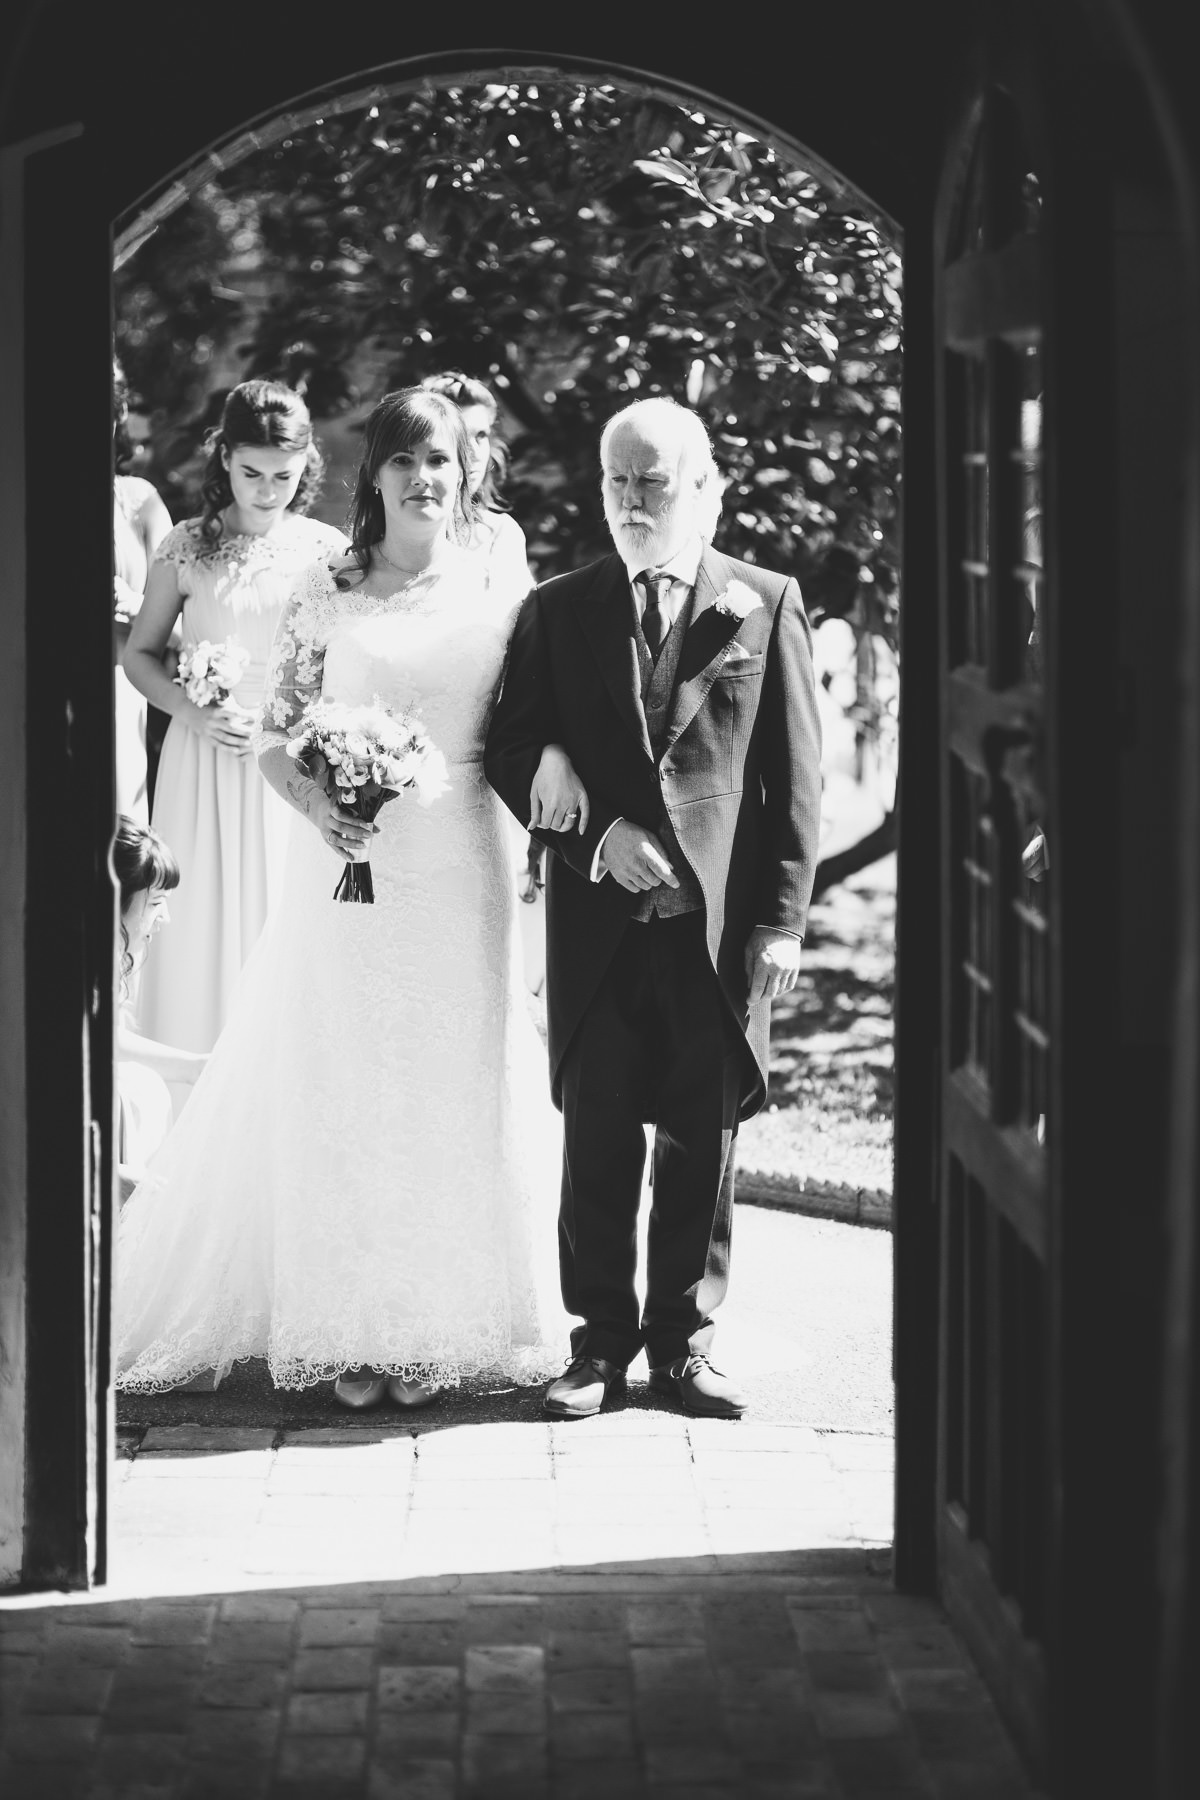 Pamber-Place-wedding-photography-basingstoke-hampshire-147